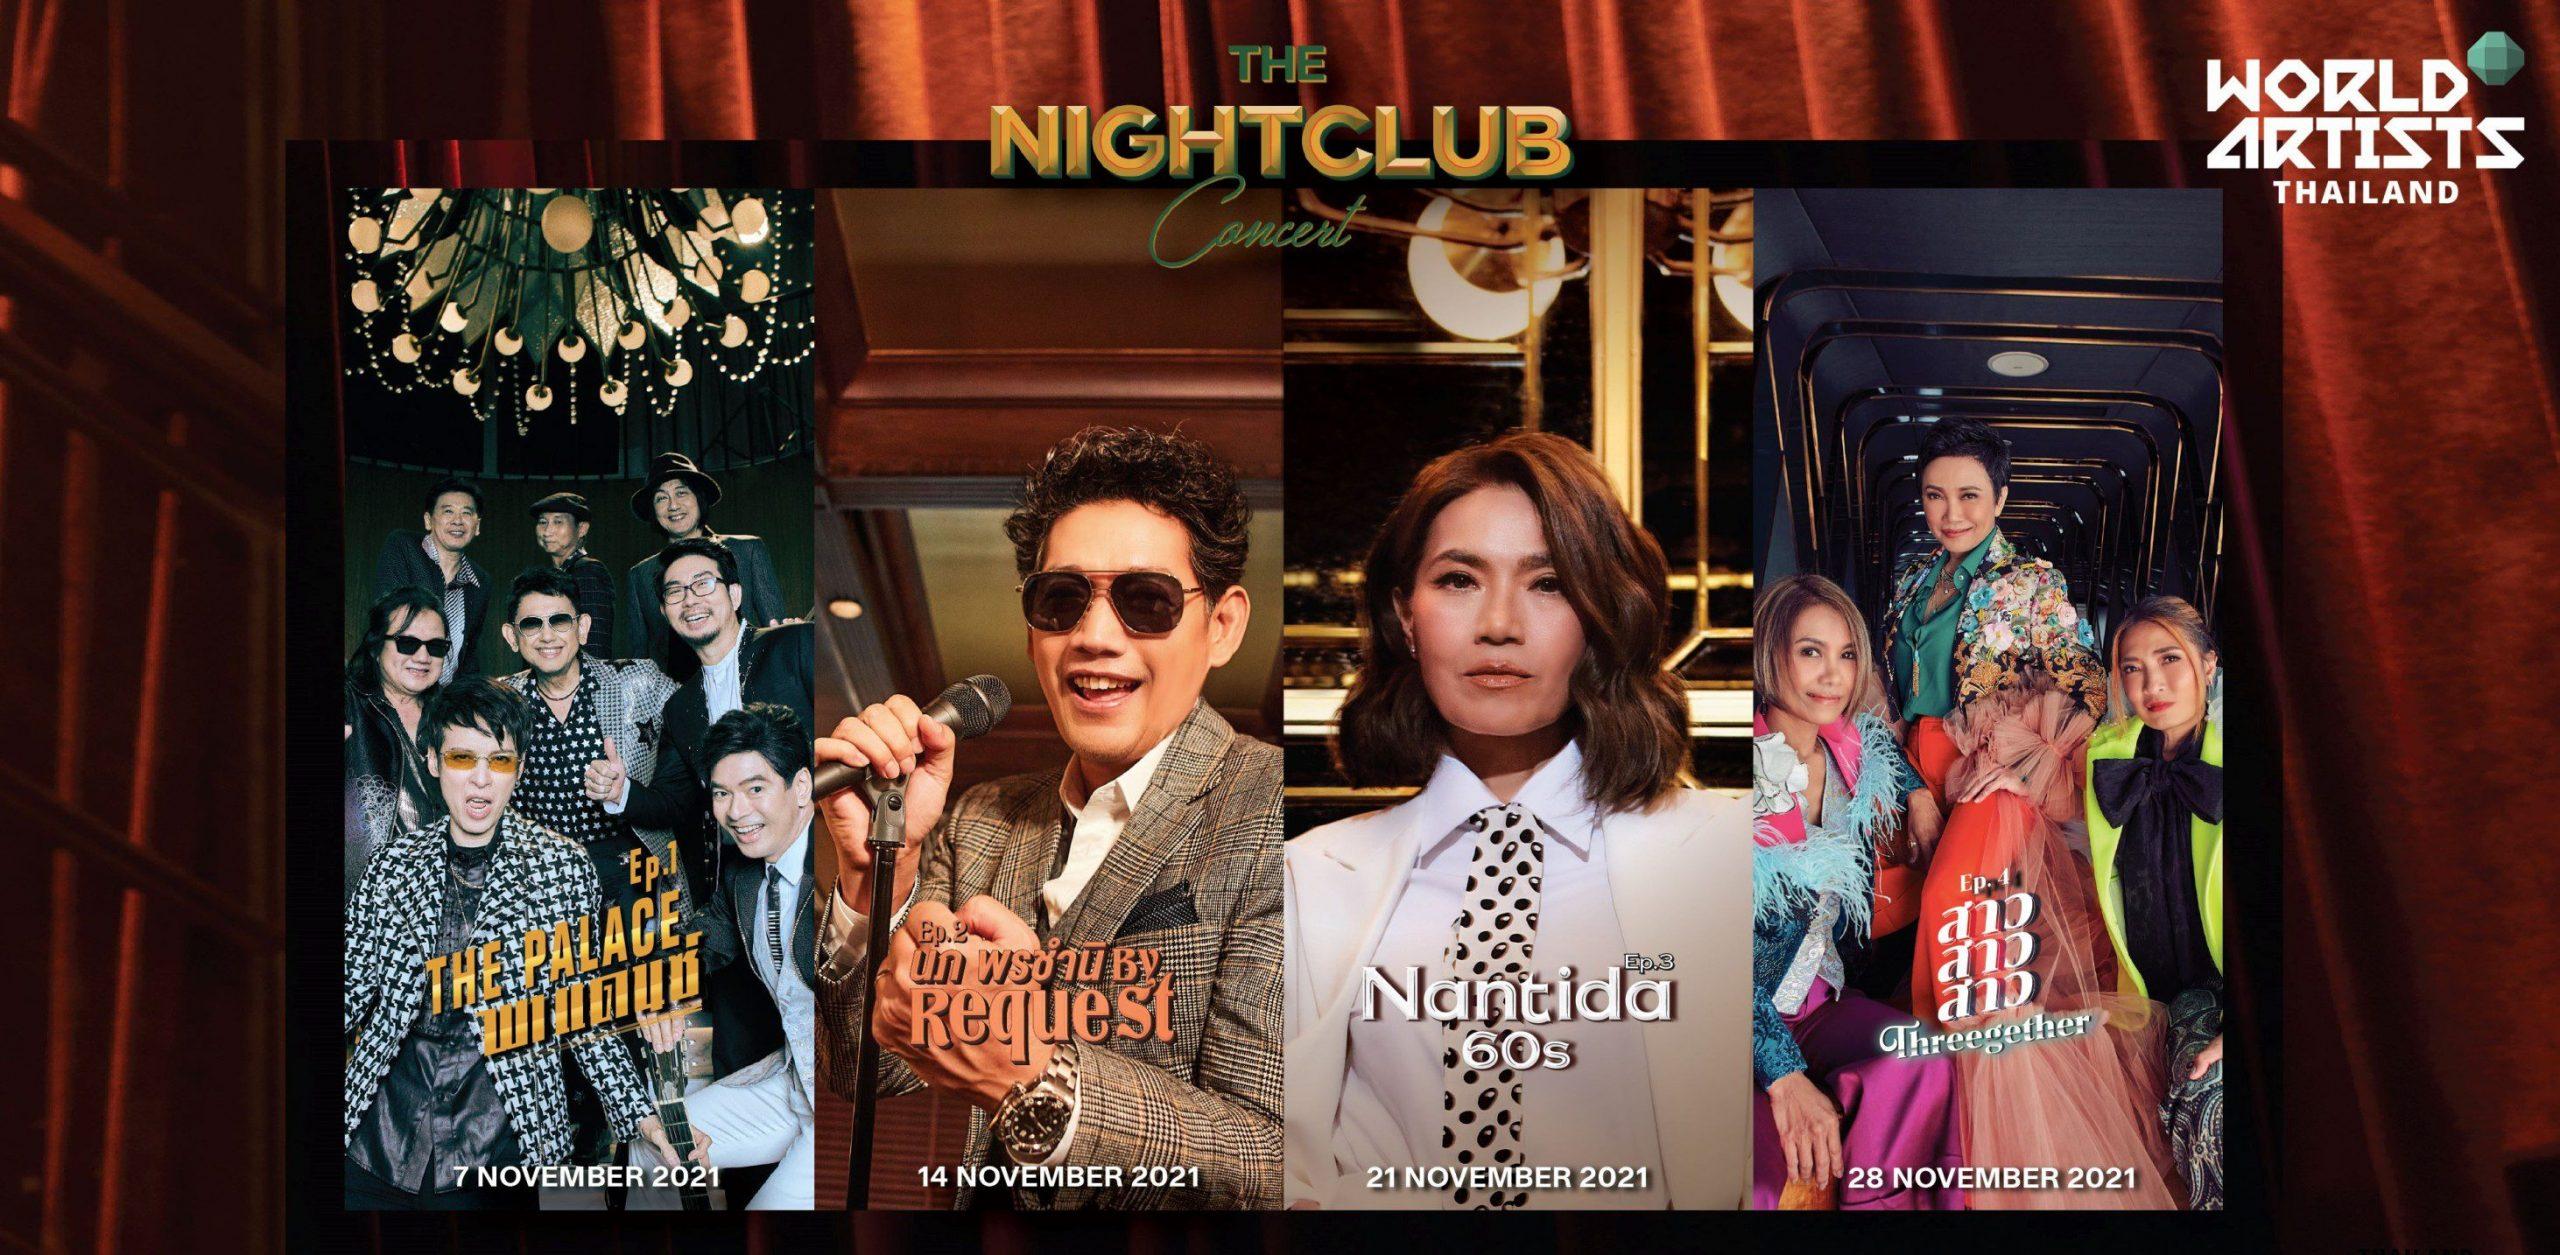 The Nightclub World Artists Thailand